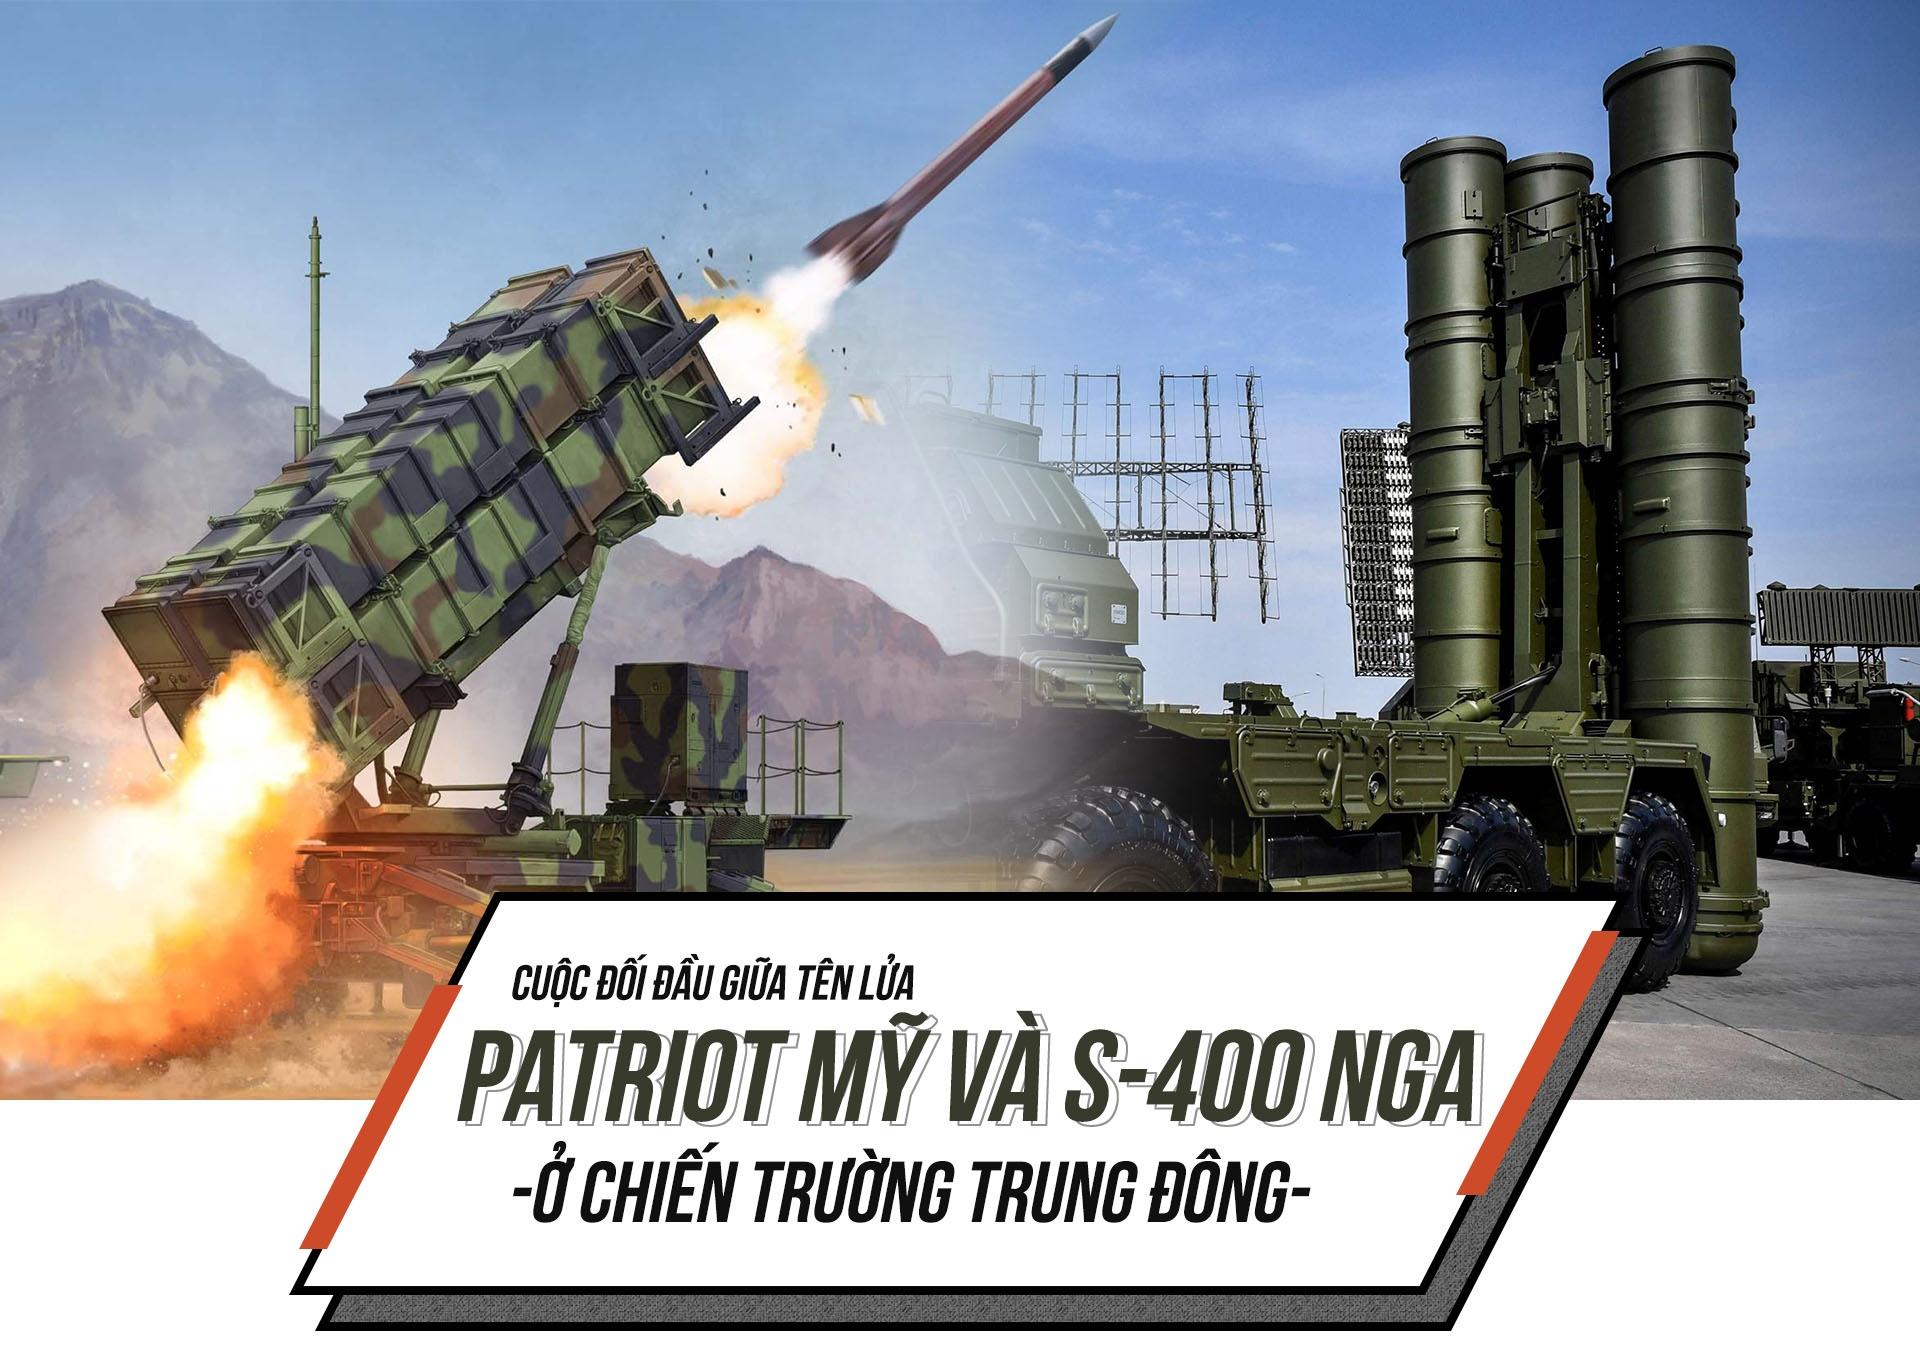 Patriot doi dau S-400 tai Trung Dong anh 2